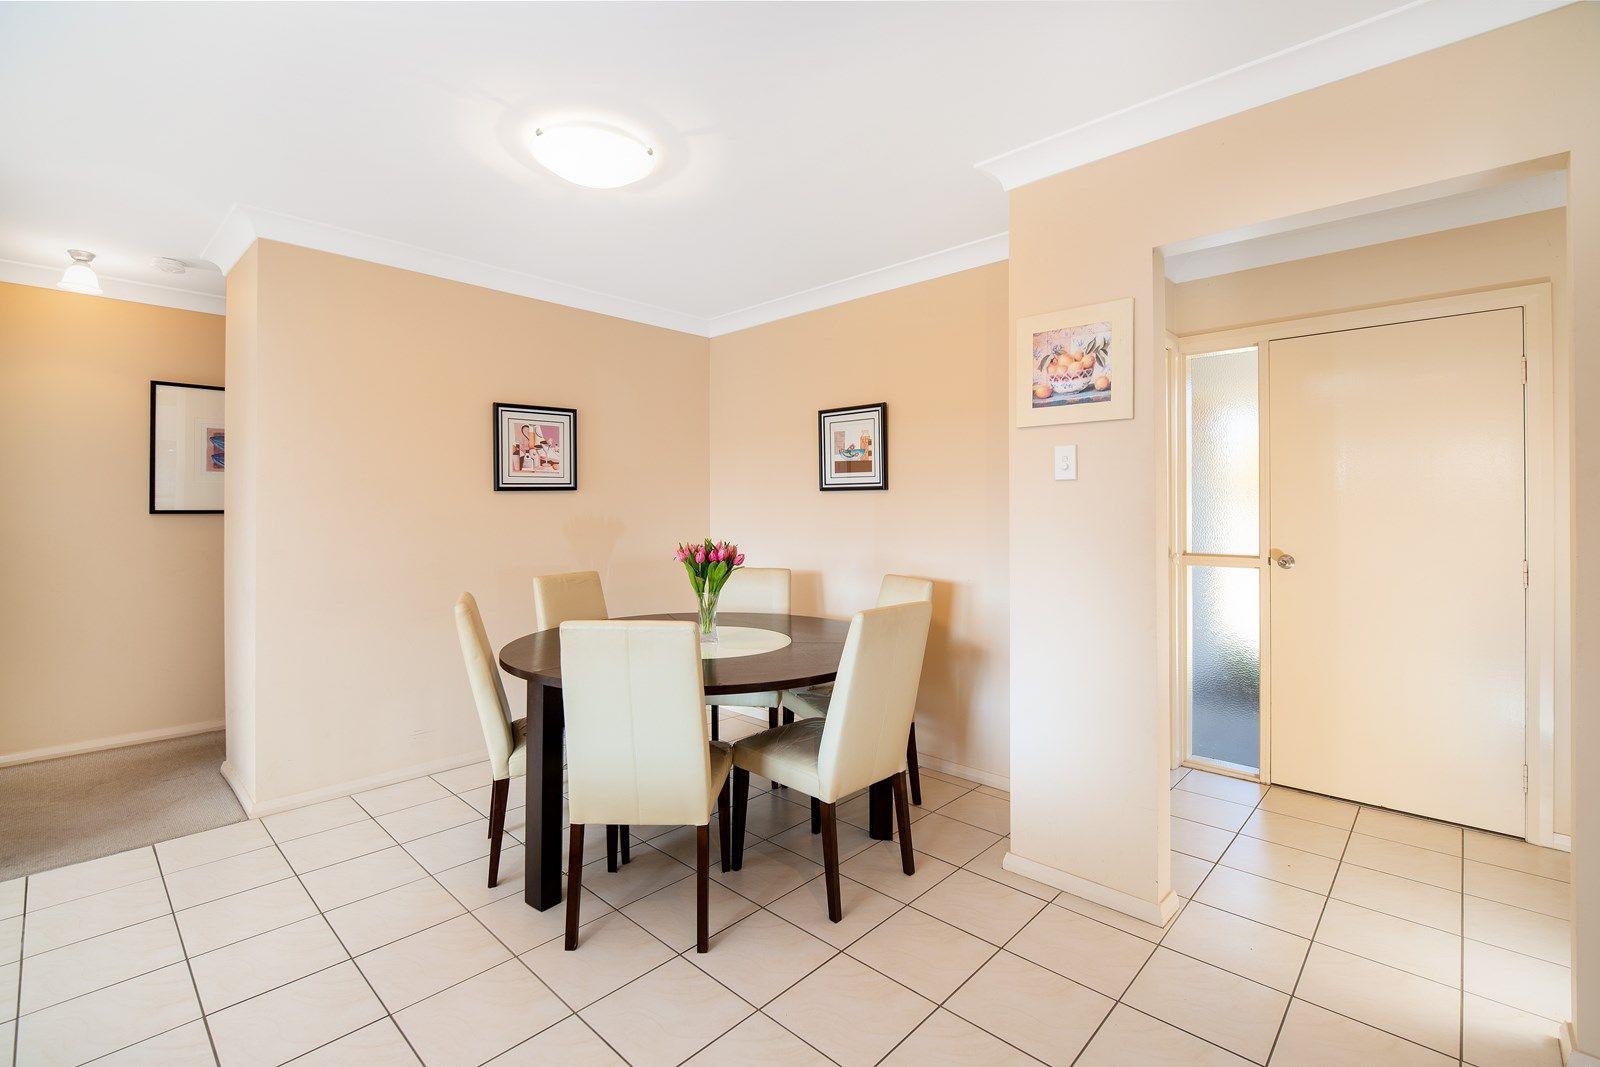 11/61 Lewis Street, Mudgee NSW 2850, Image 2